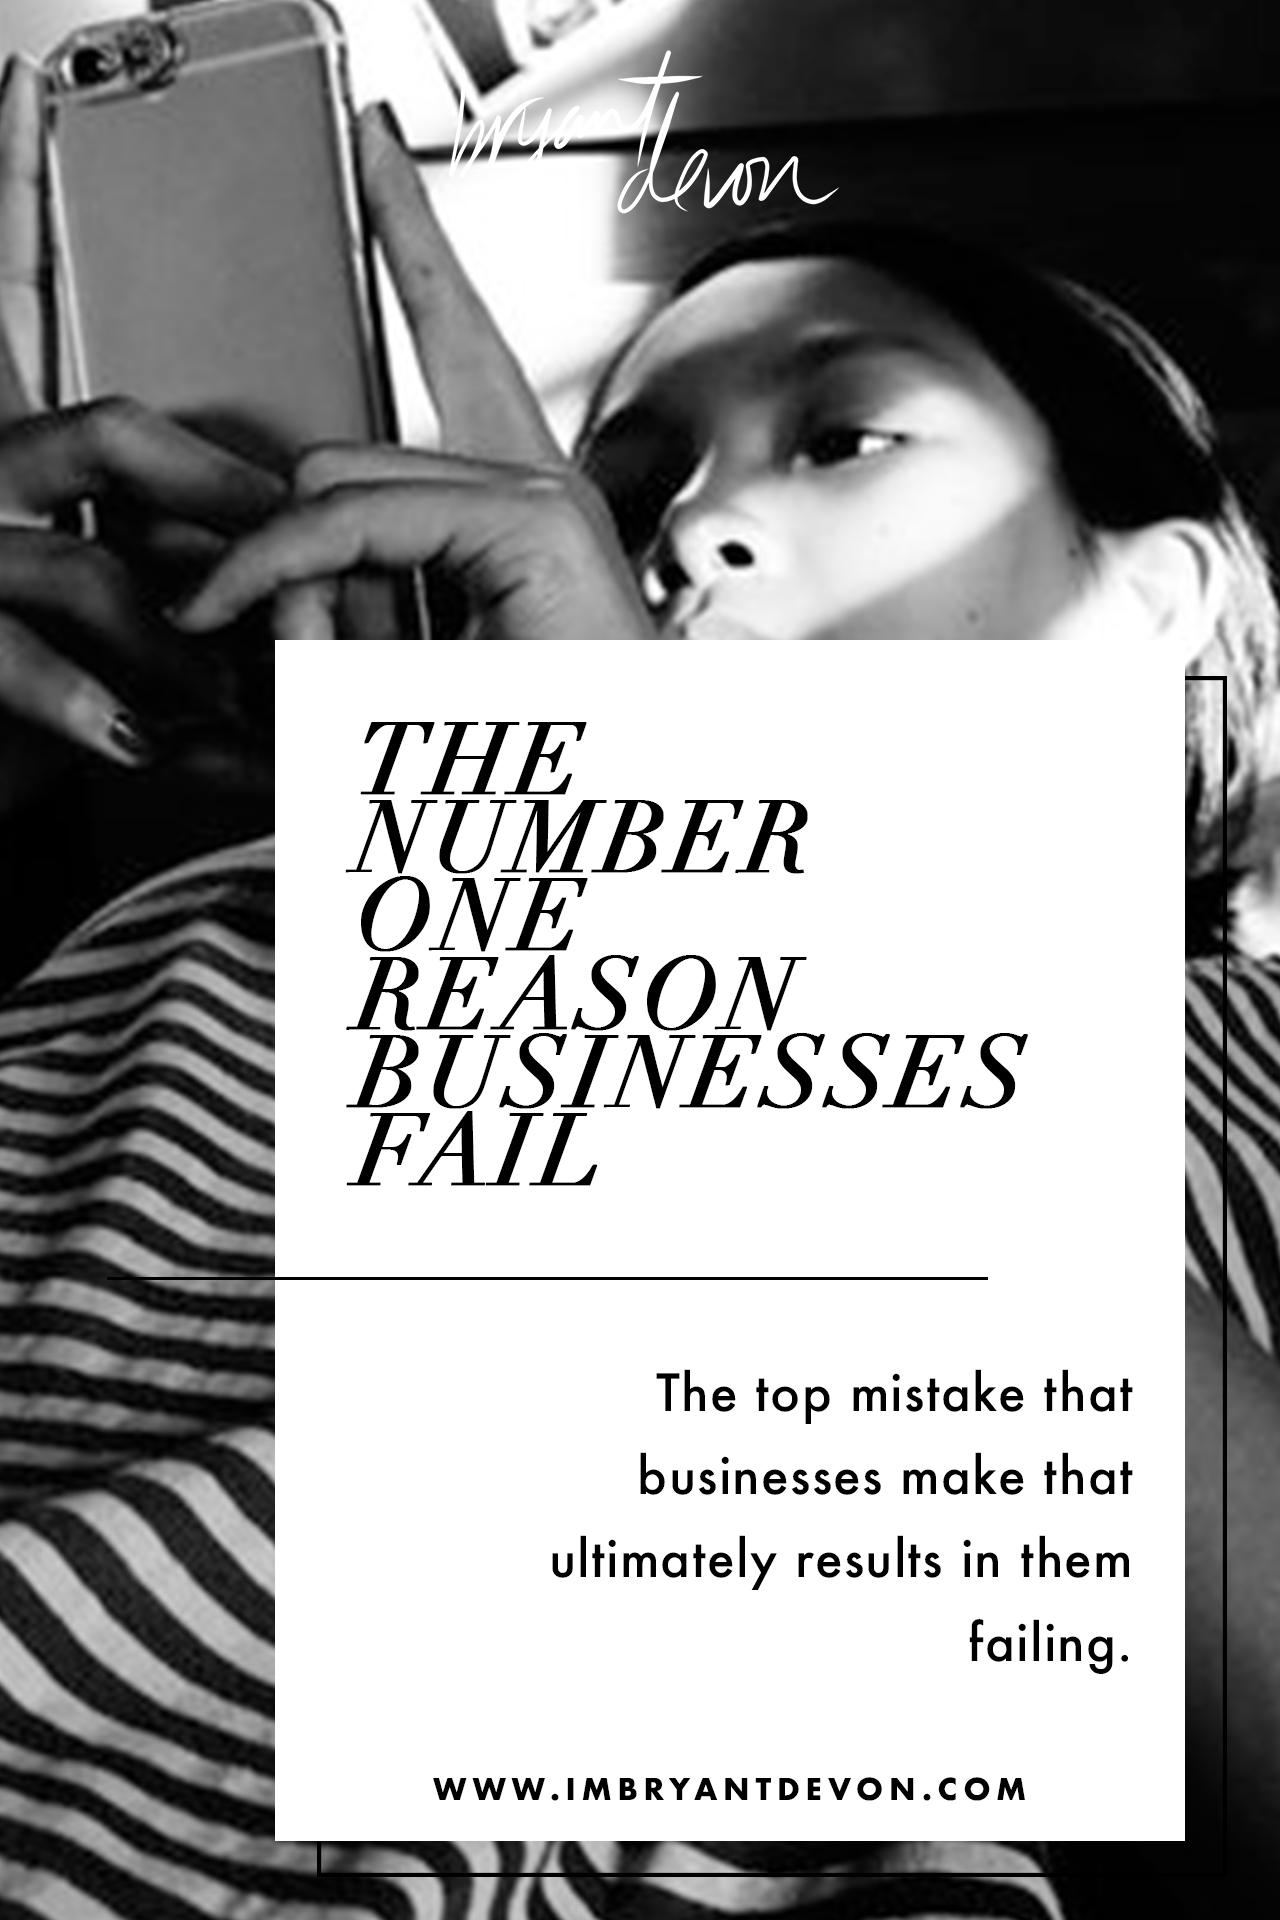 top-reason-business-fail-bryantdevon-imbryantdevon.jpg